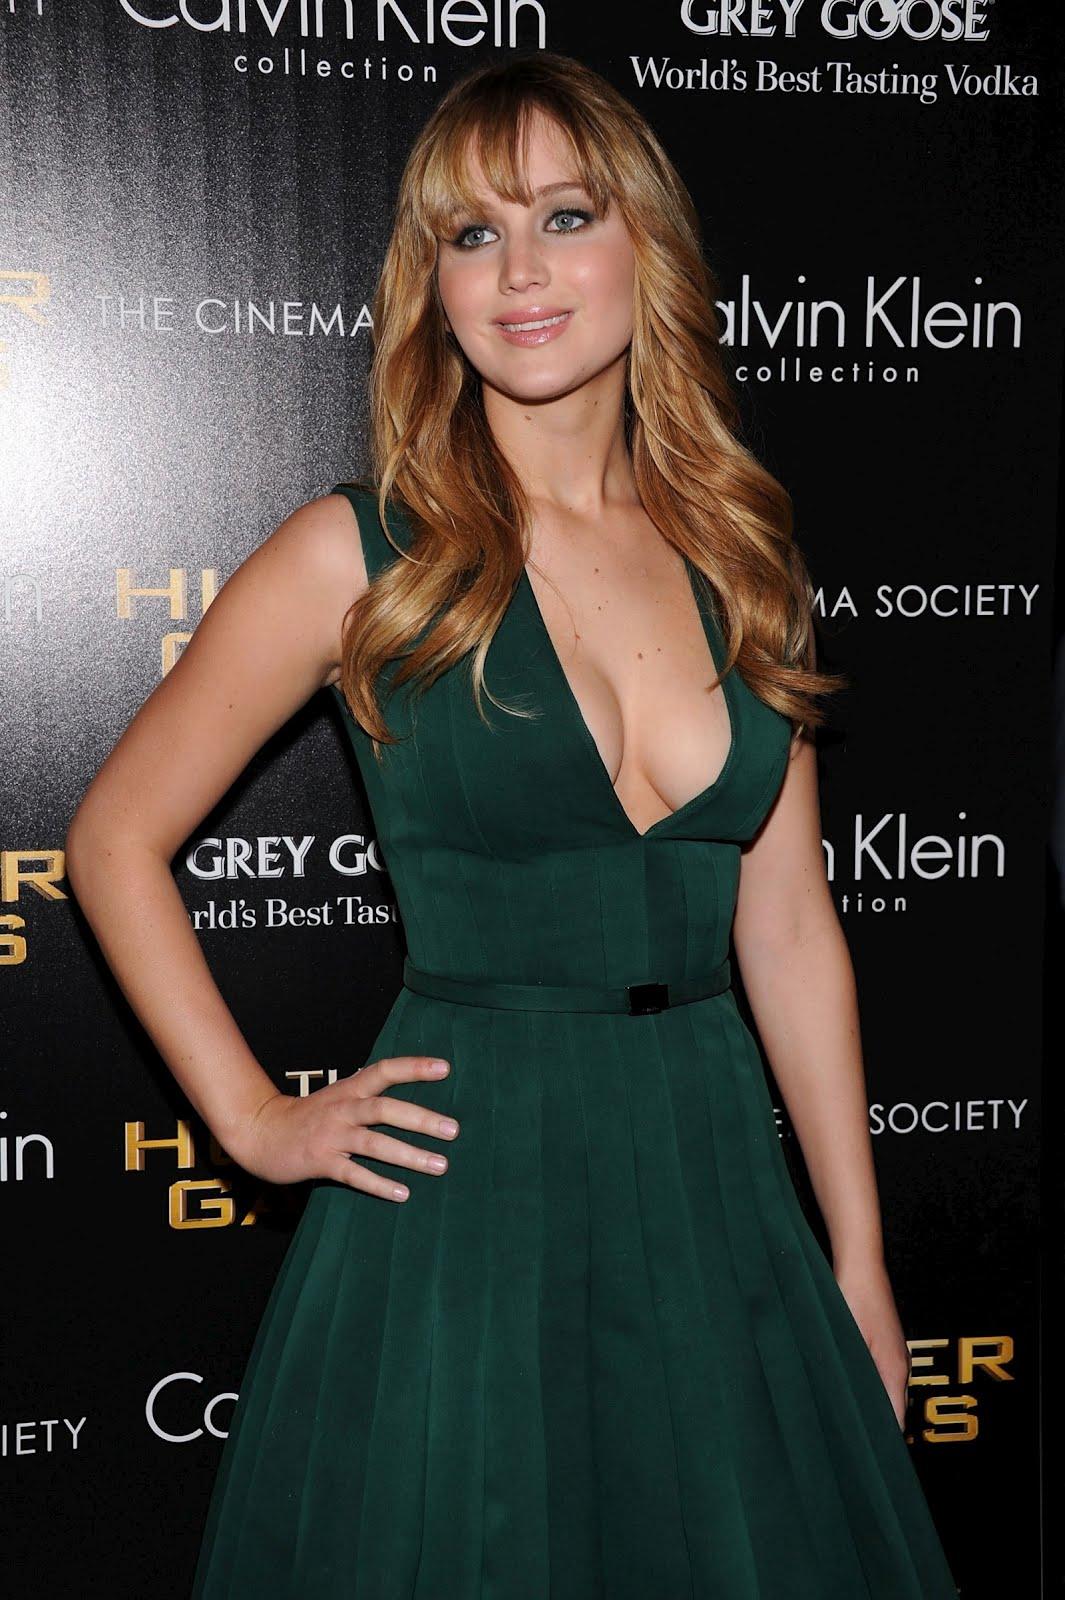 http://2.bp.blogspot.com/-cUCzNDhf3TE/T2o9AoC756I/AAAAAAAAPhc/po7o-UQBgf4/s1600/Jennifer_Lawrence_hollywood_beauty_picture_premiere_smile.jpg